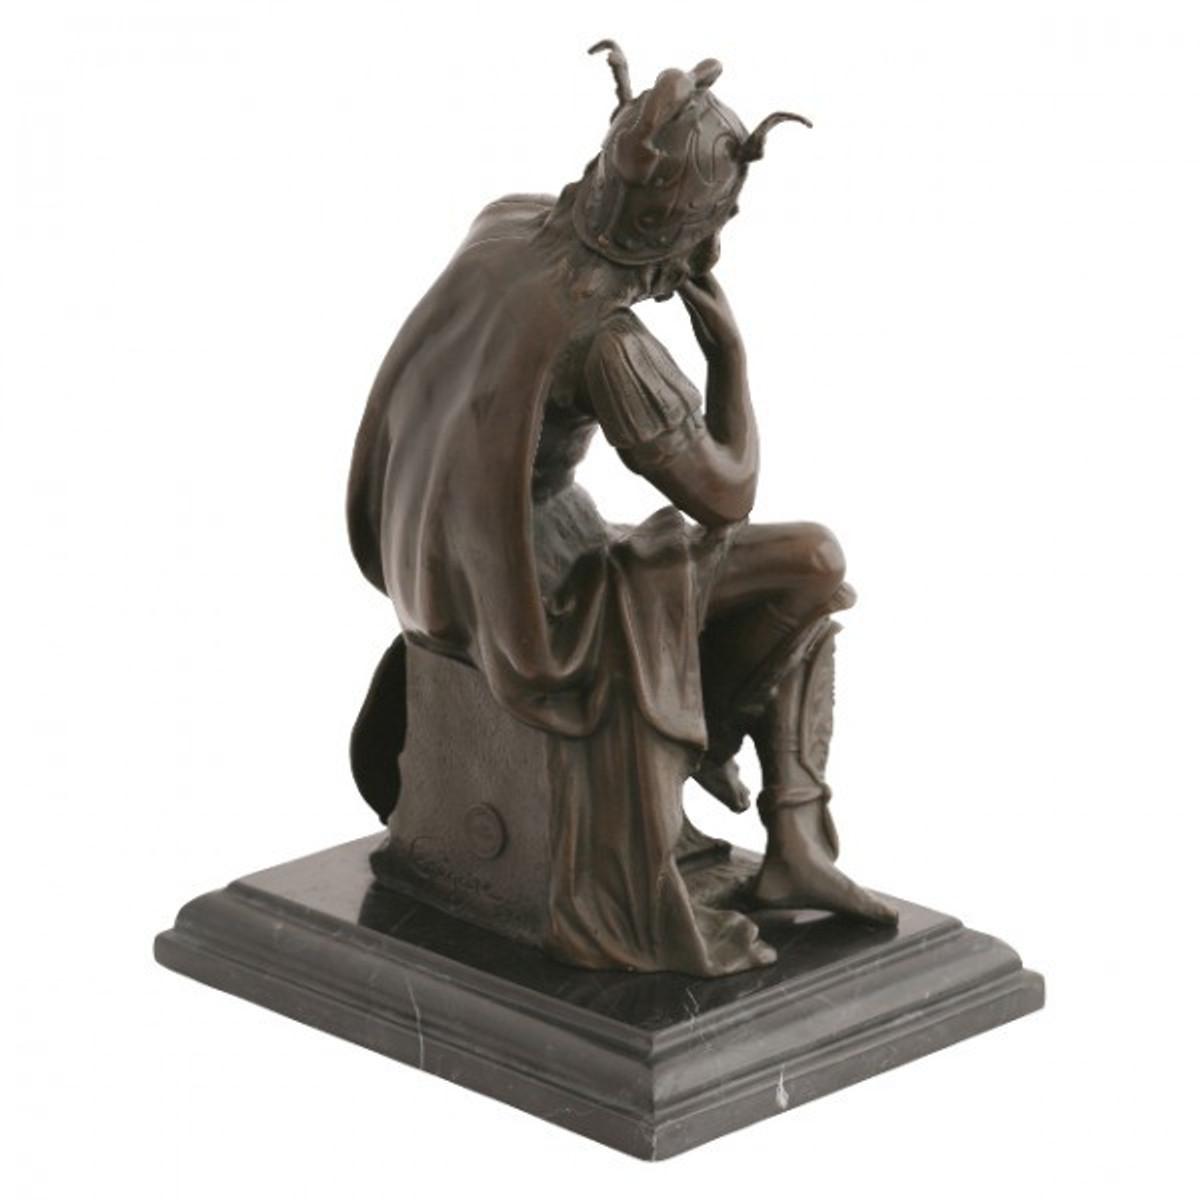 Statuen antike dekoration mann legion r deko garten figur for Antike dekoration